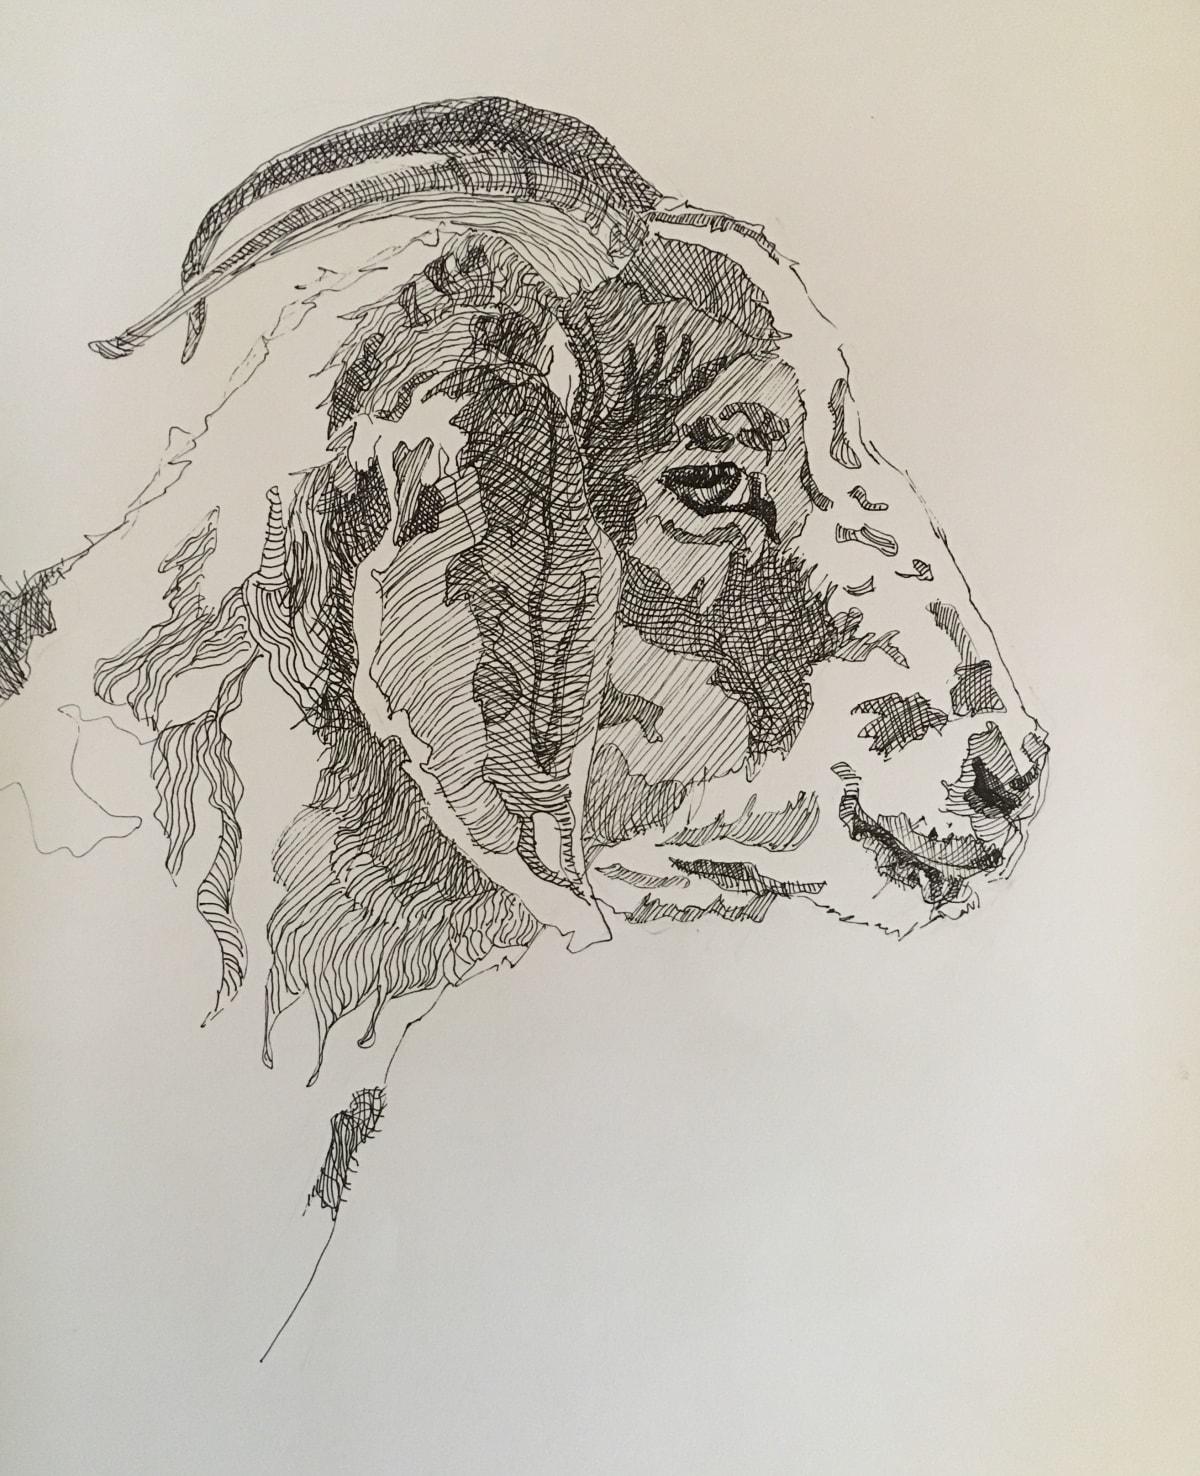 Vivien Budge , Transkei goat, 2018